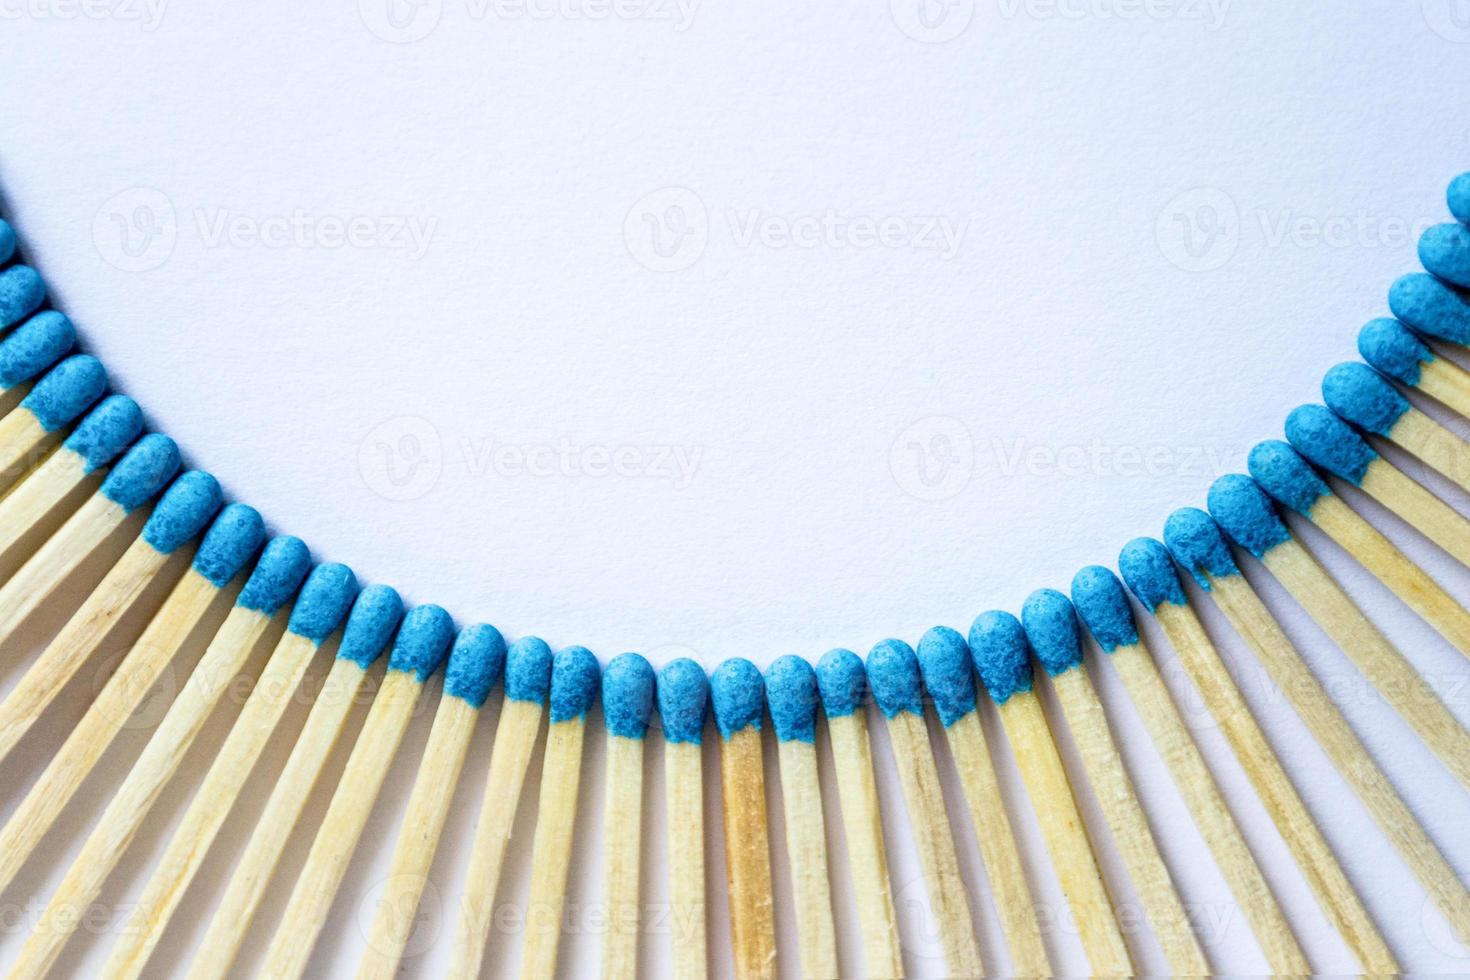 Semielliptical frame matches photo